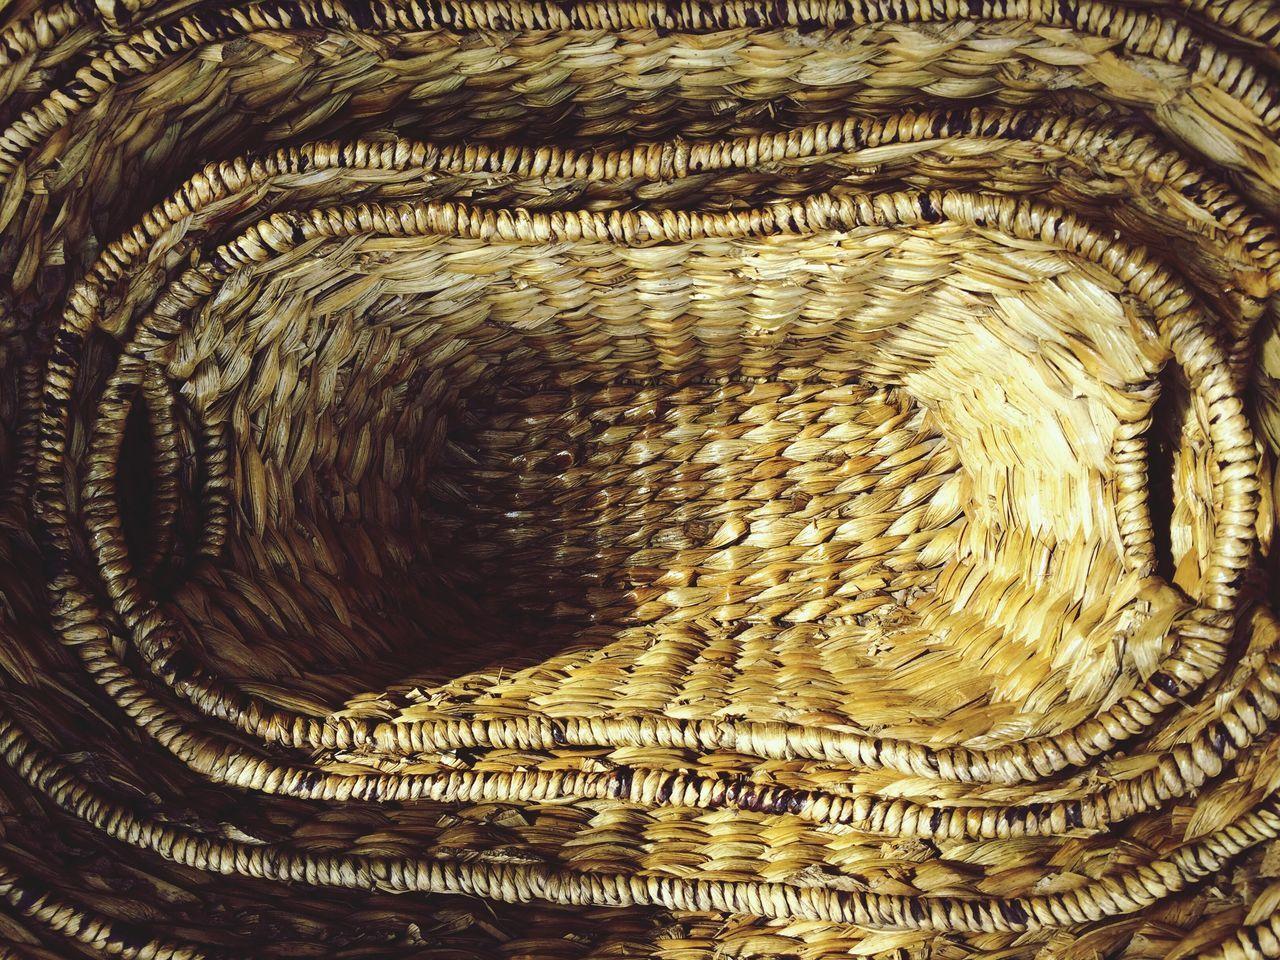 Weaved baskets. Filipino crafts. Culture Crafts Art